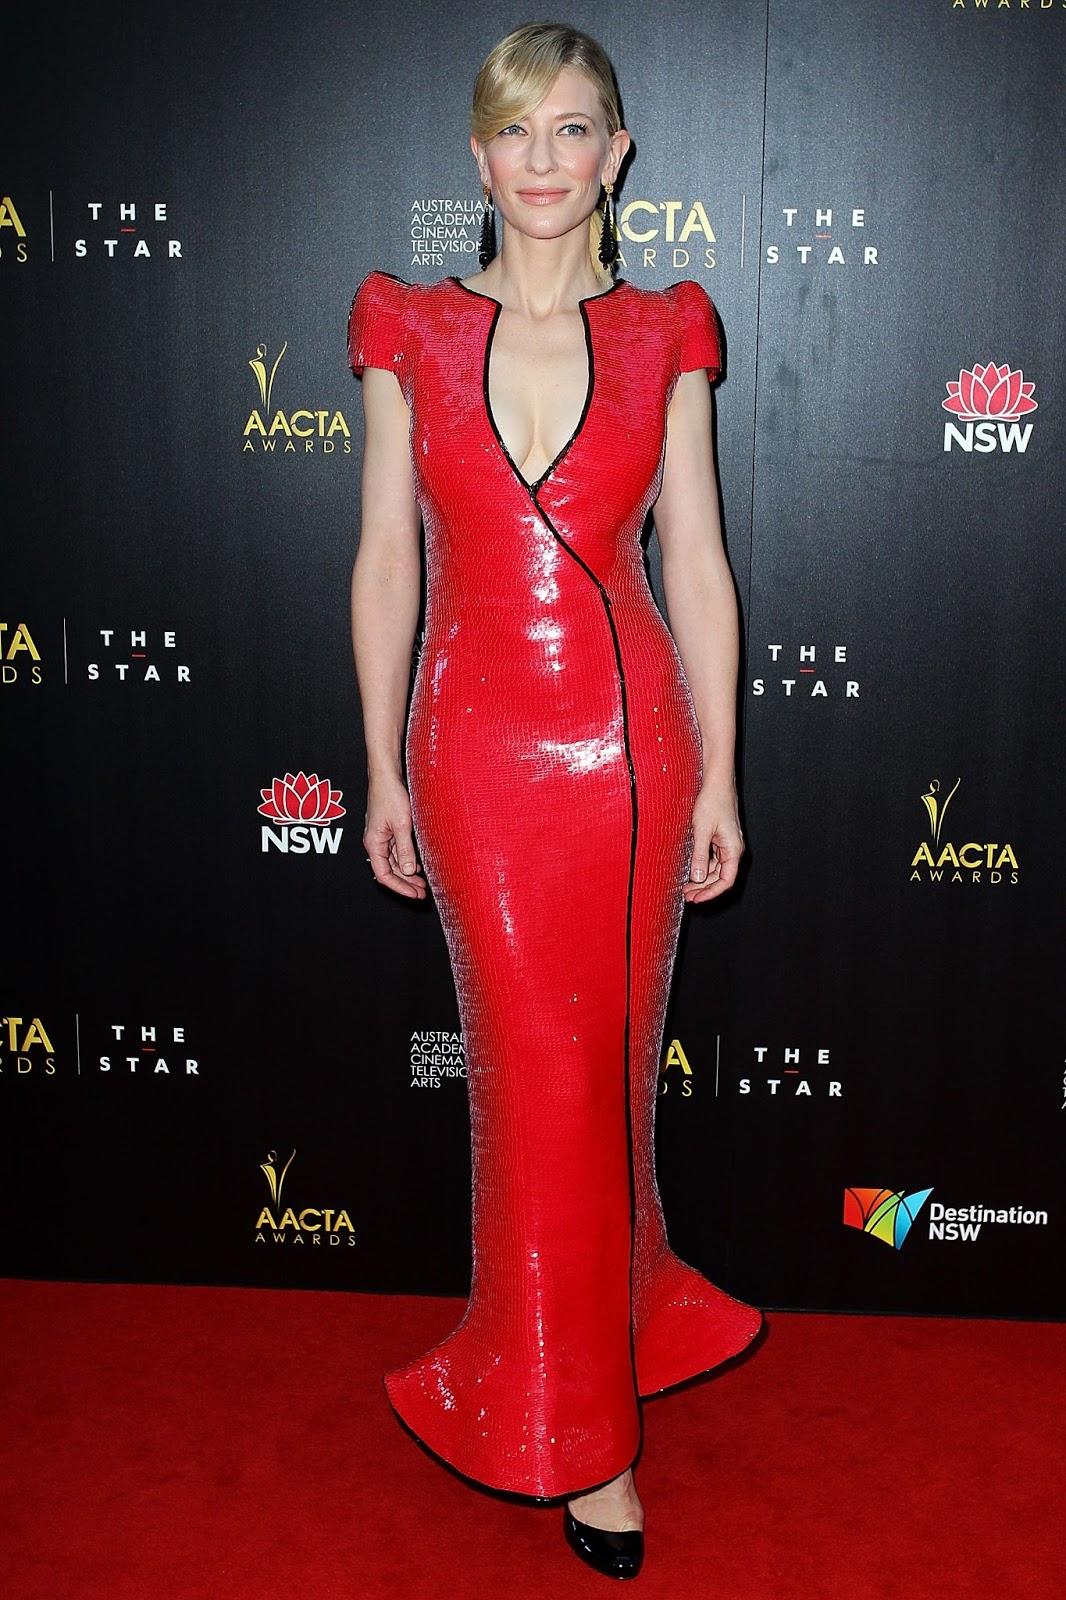 http://4.bp.blogspot.com/-7bPeOQ3KpSw/USD5R1Zf8TI/AAAAAAAAB1o/nt1lW9vkPlA/s1600/Cate-Blanchett_giorgio_armani_prive_red_latex_like.jpg